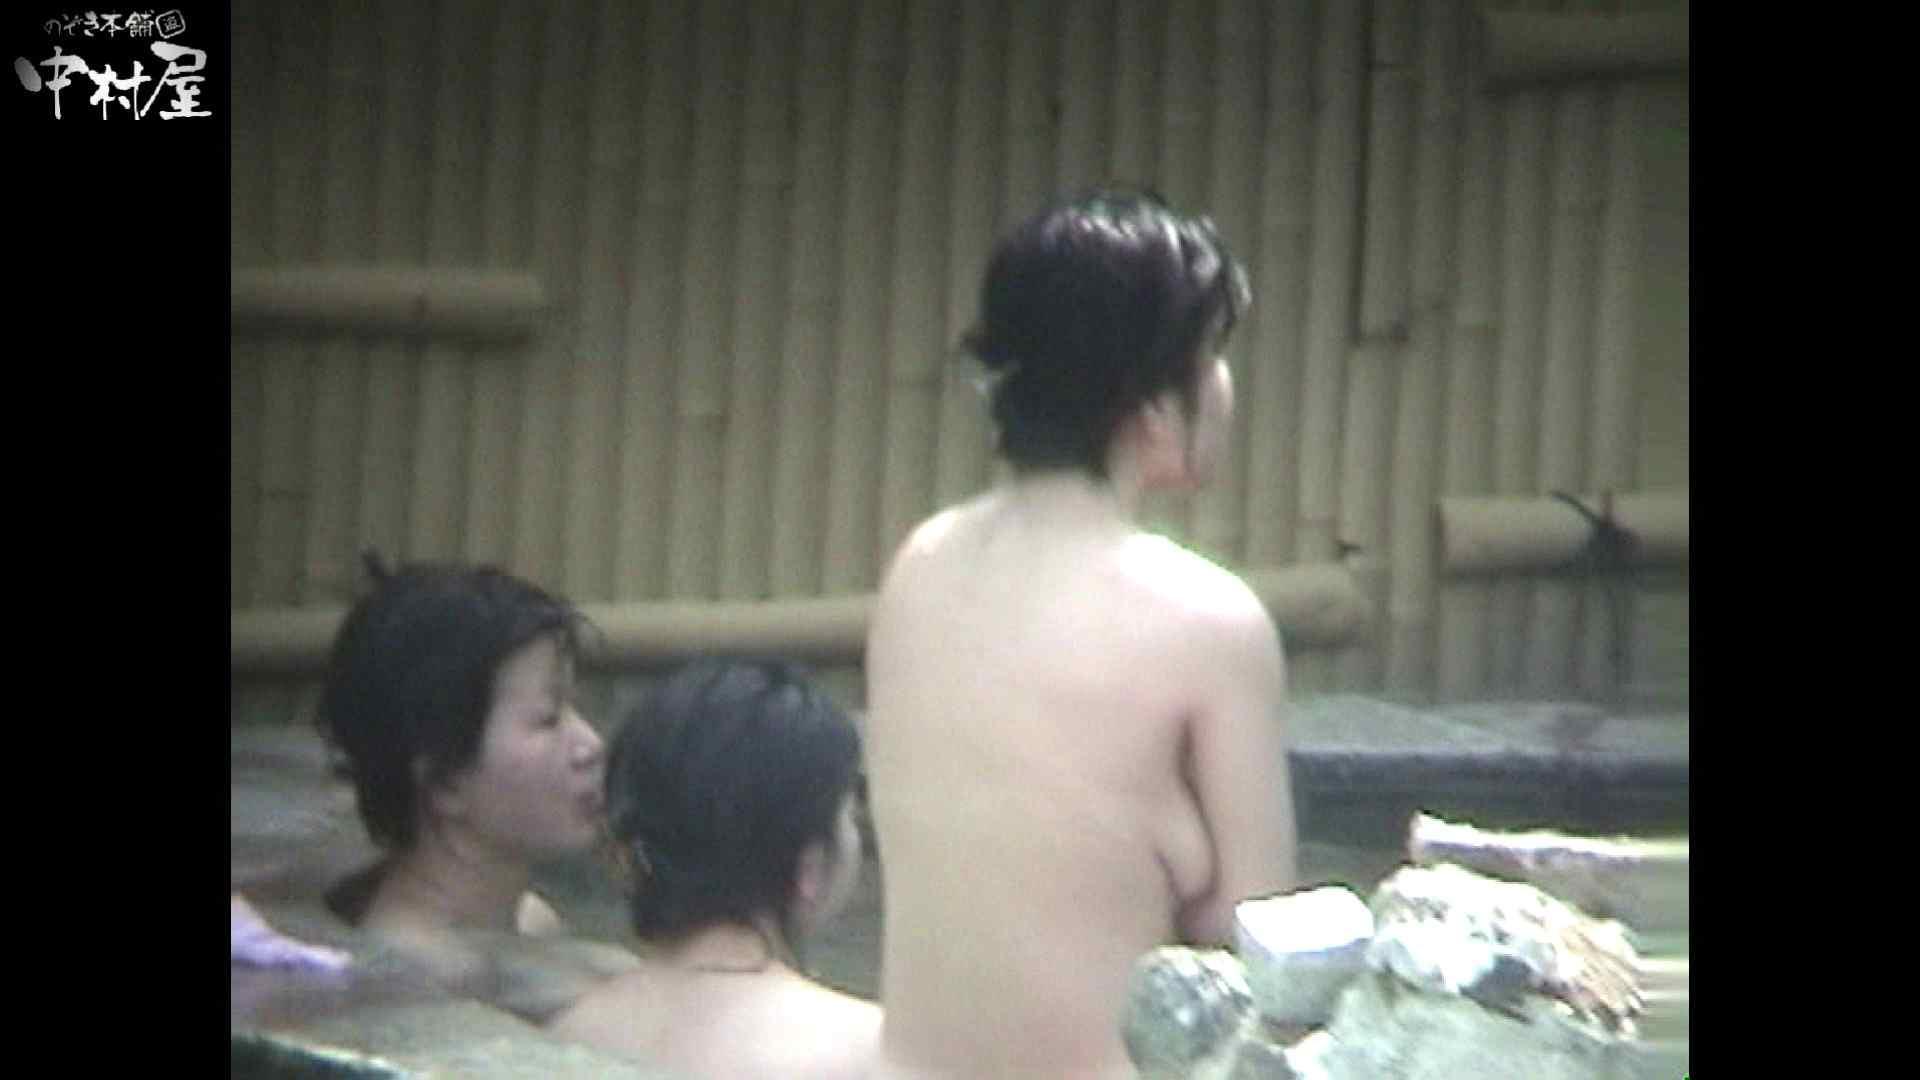 Aquaな露天風呂Vol.936 盗撮映像  110Pix 90